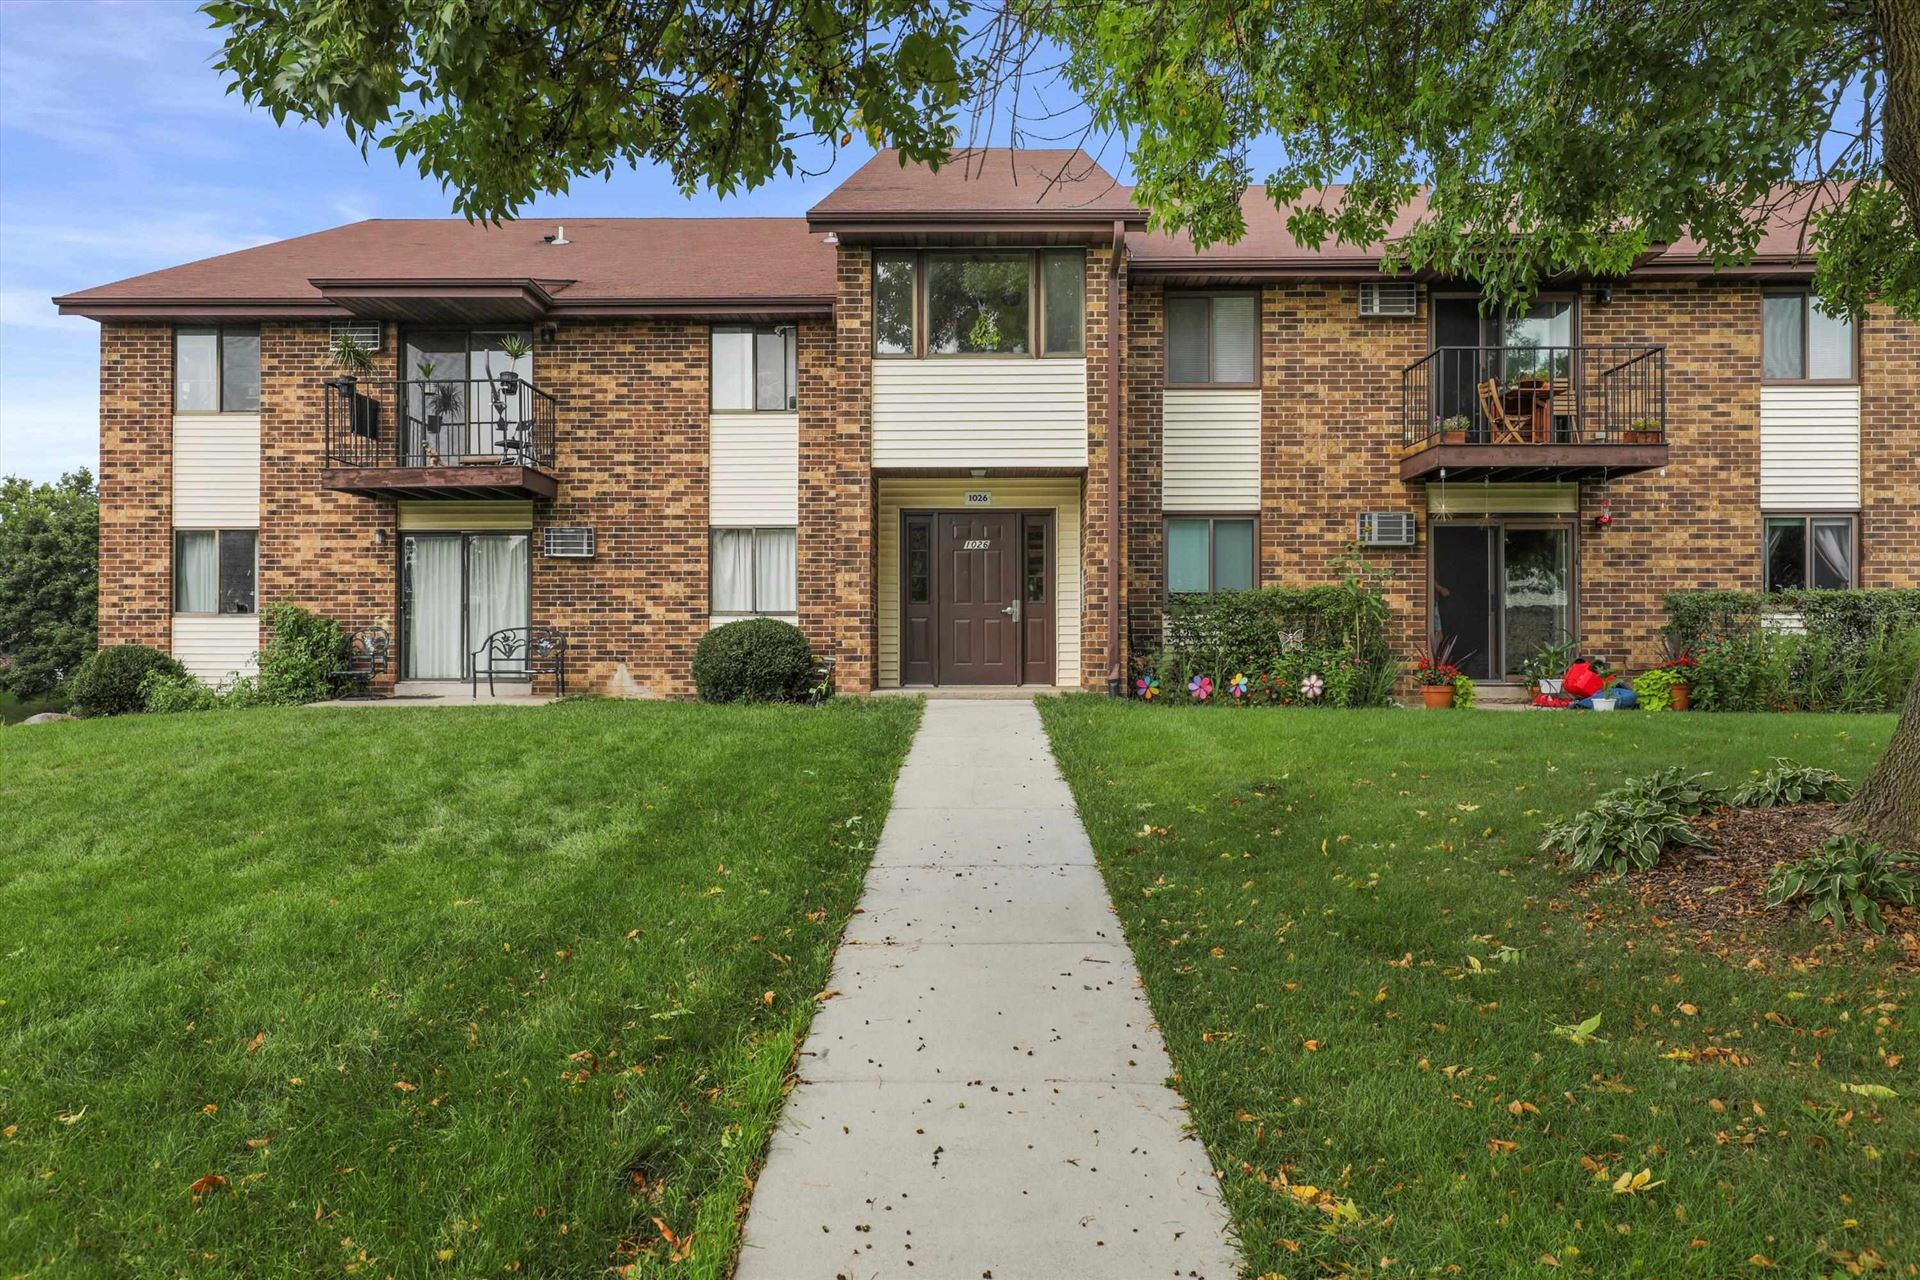 1026 S Sunnyvale Ln #B, Madison, WI 53713 - #: 1919750